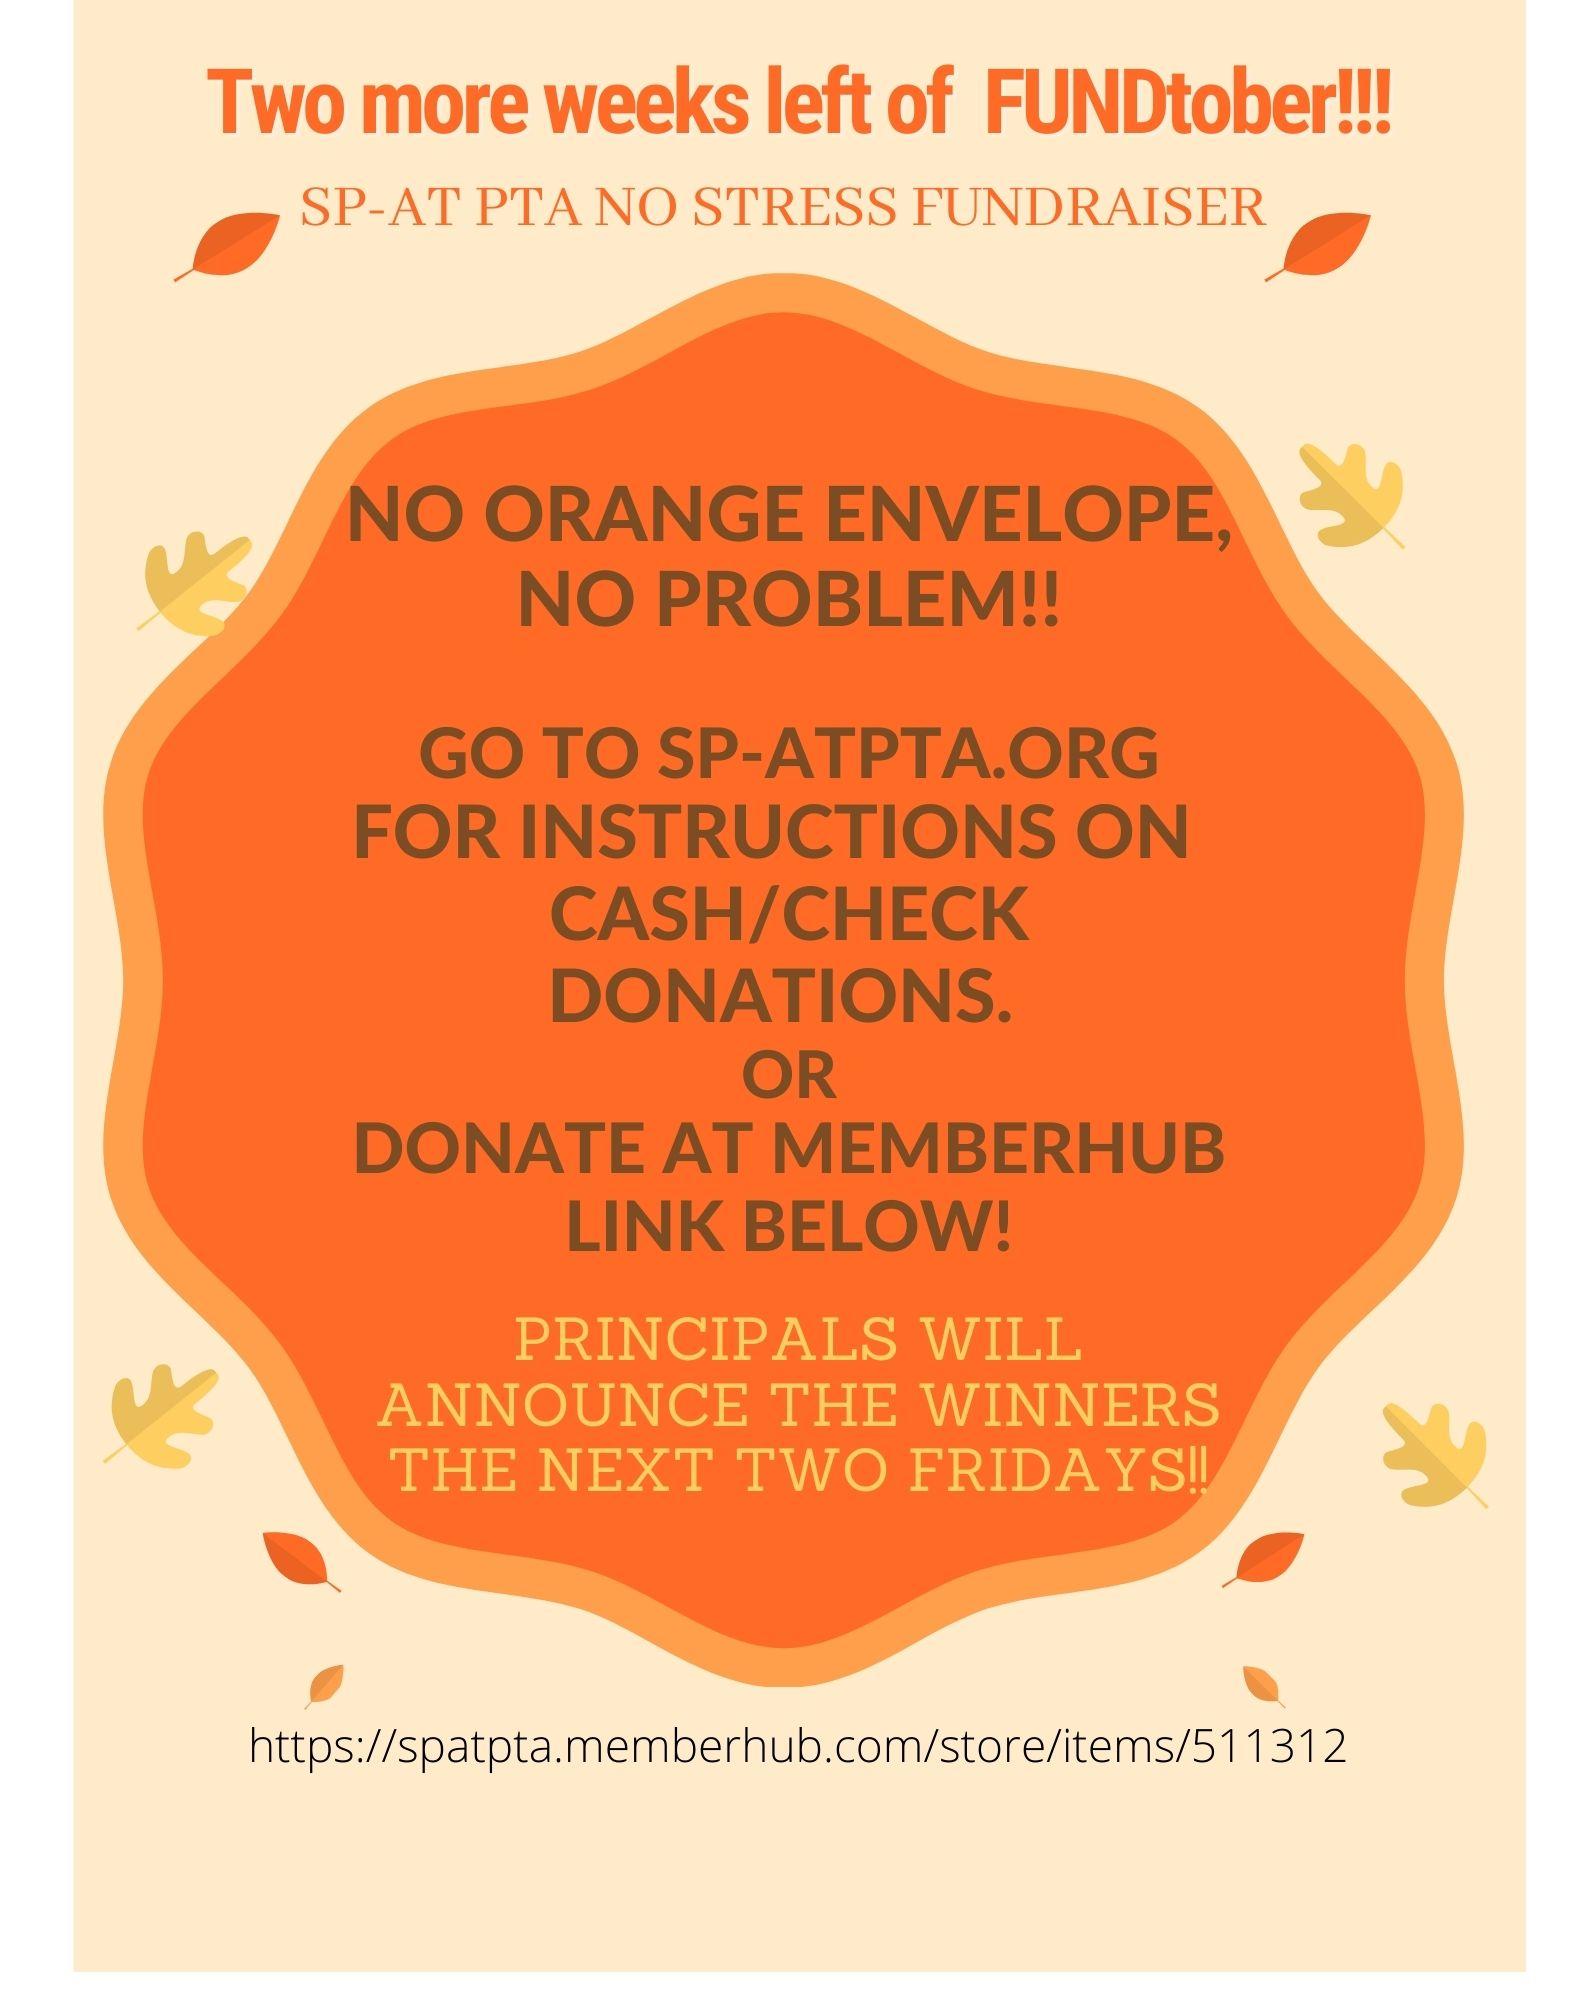 No Orange Envelope? No Problem!